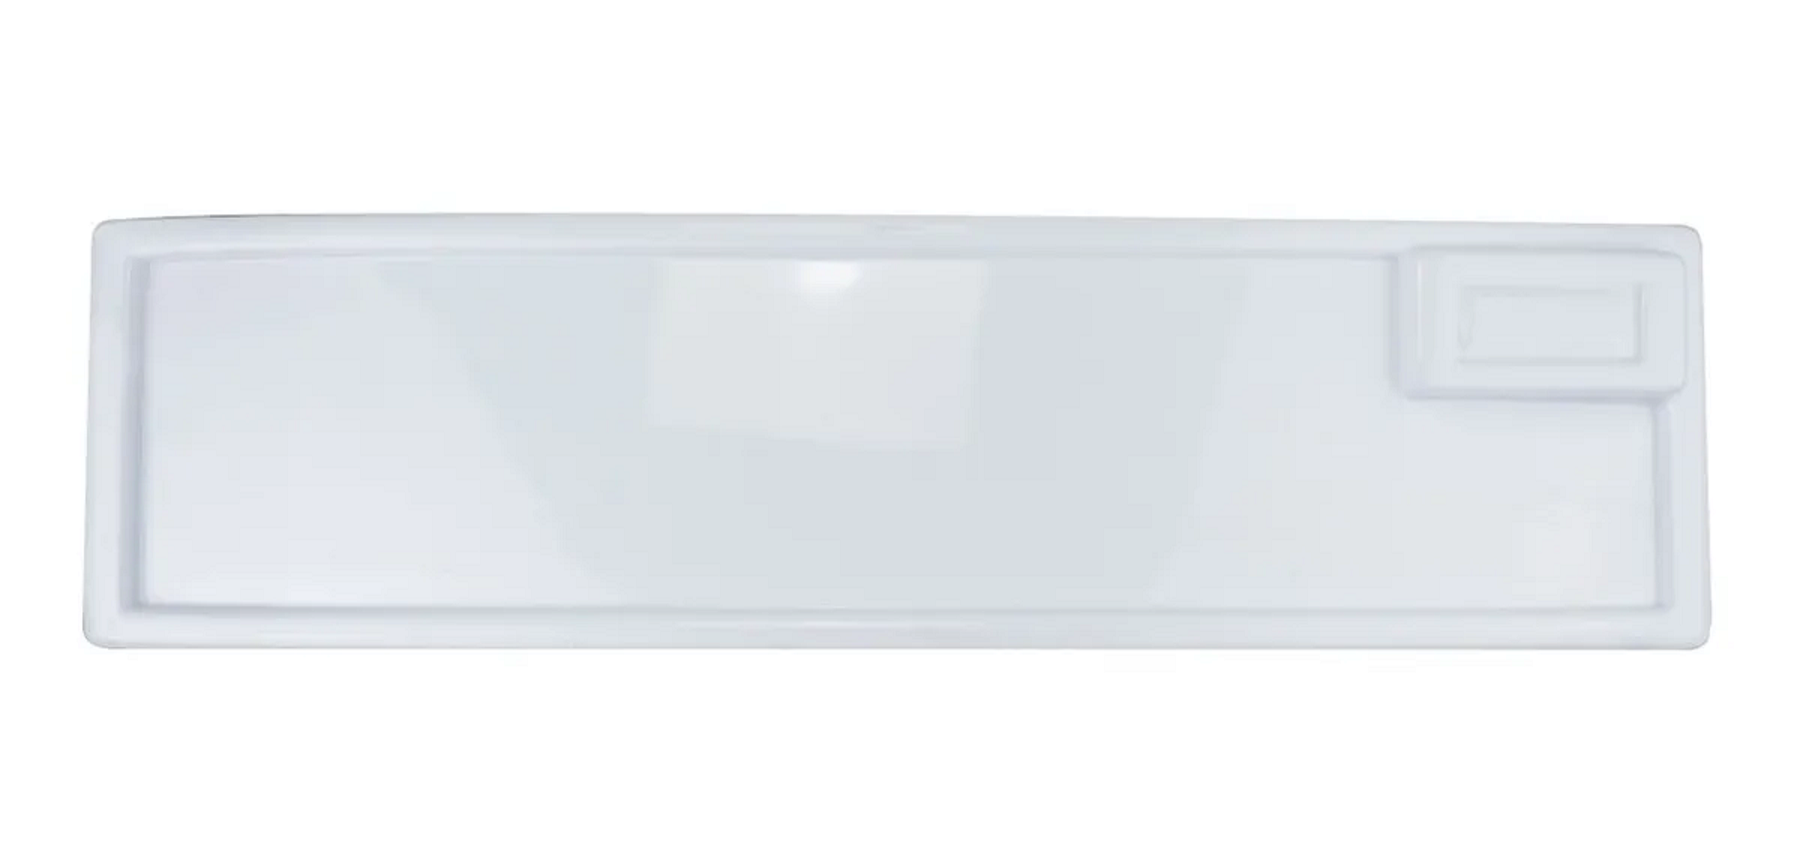 Testeira para Freezer Fricon Antiga Branca - Medida 19x67 cm